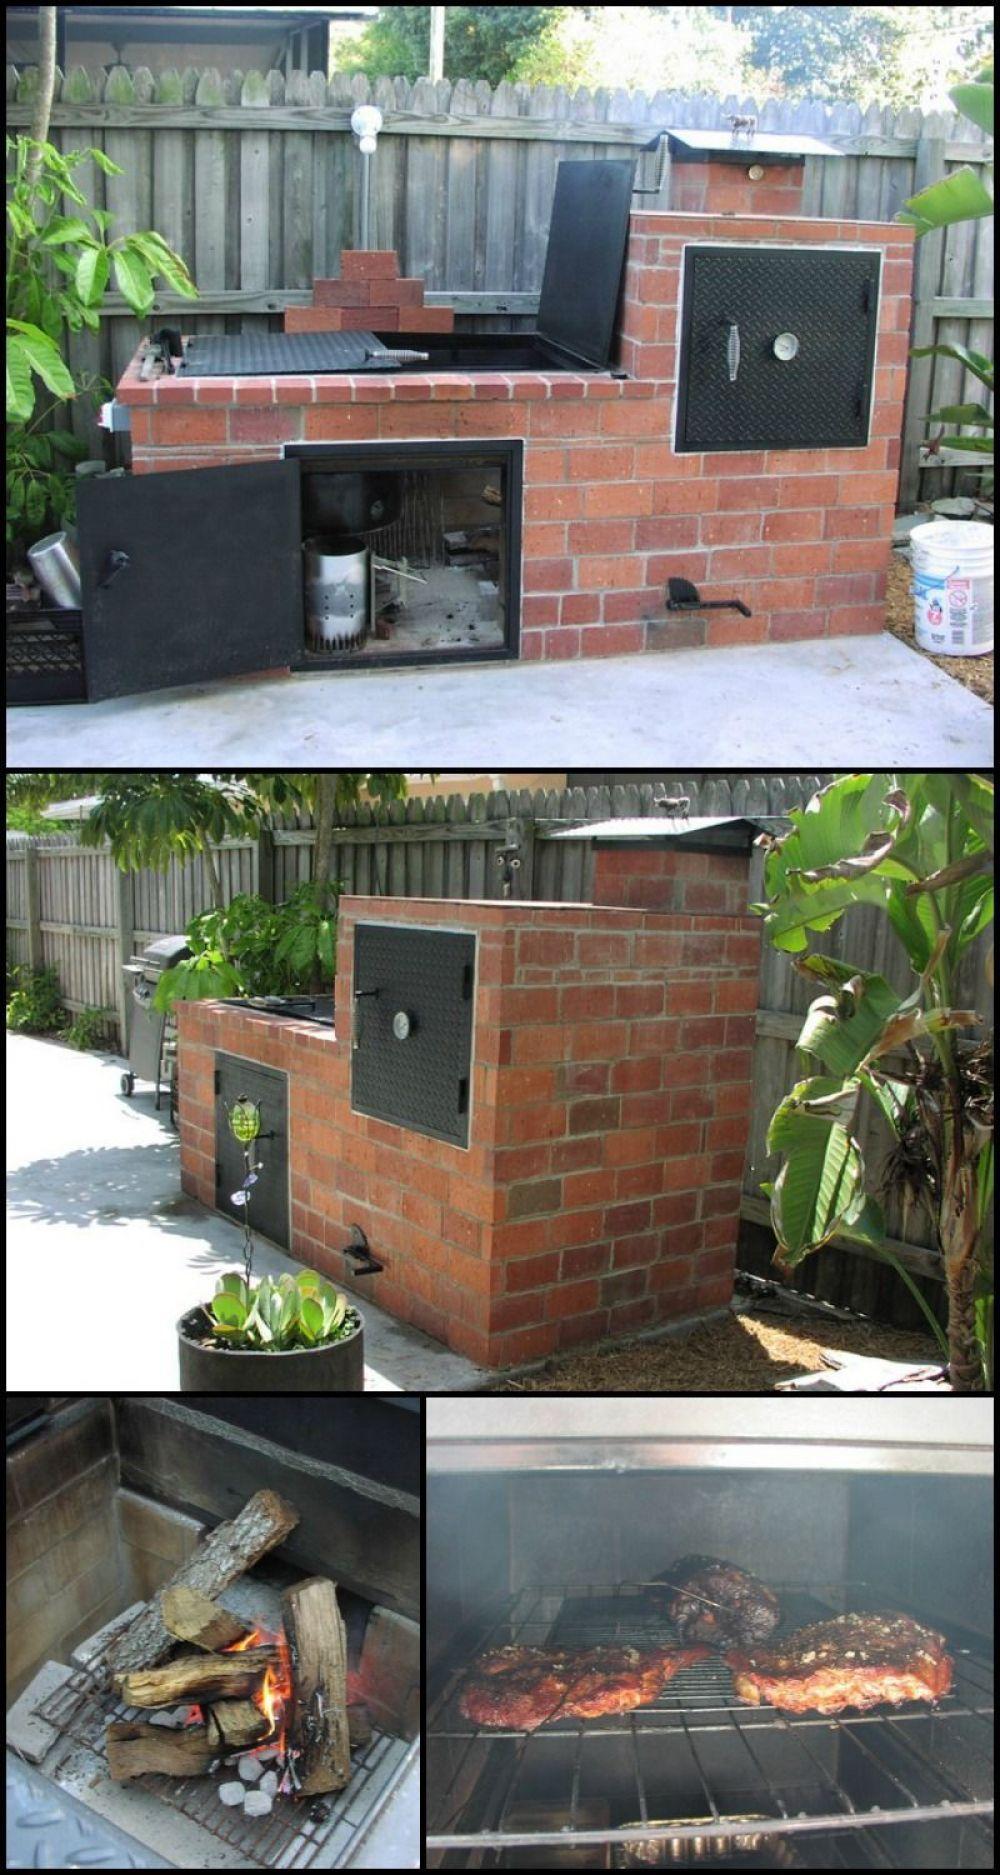 25 Best DIY Backyard Brick Barbecue Ideas in 2020 | Brick ... on Diy Bbq Patio id=23670